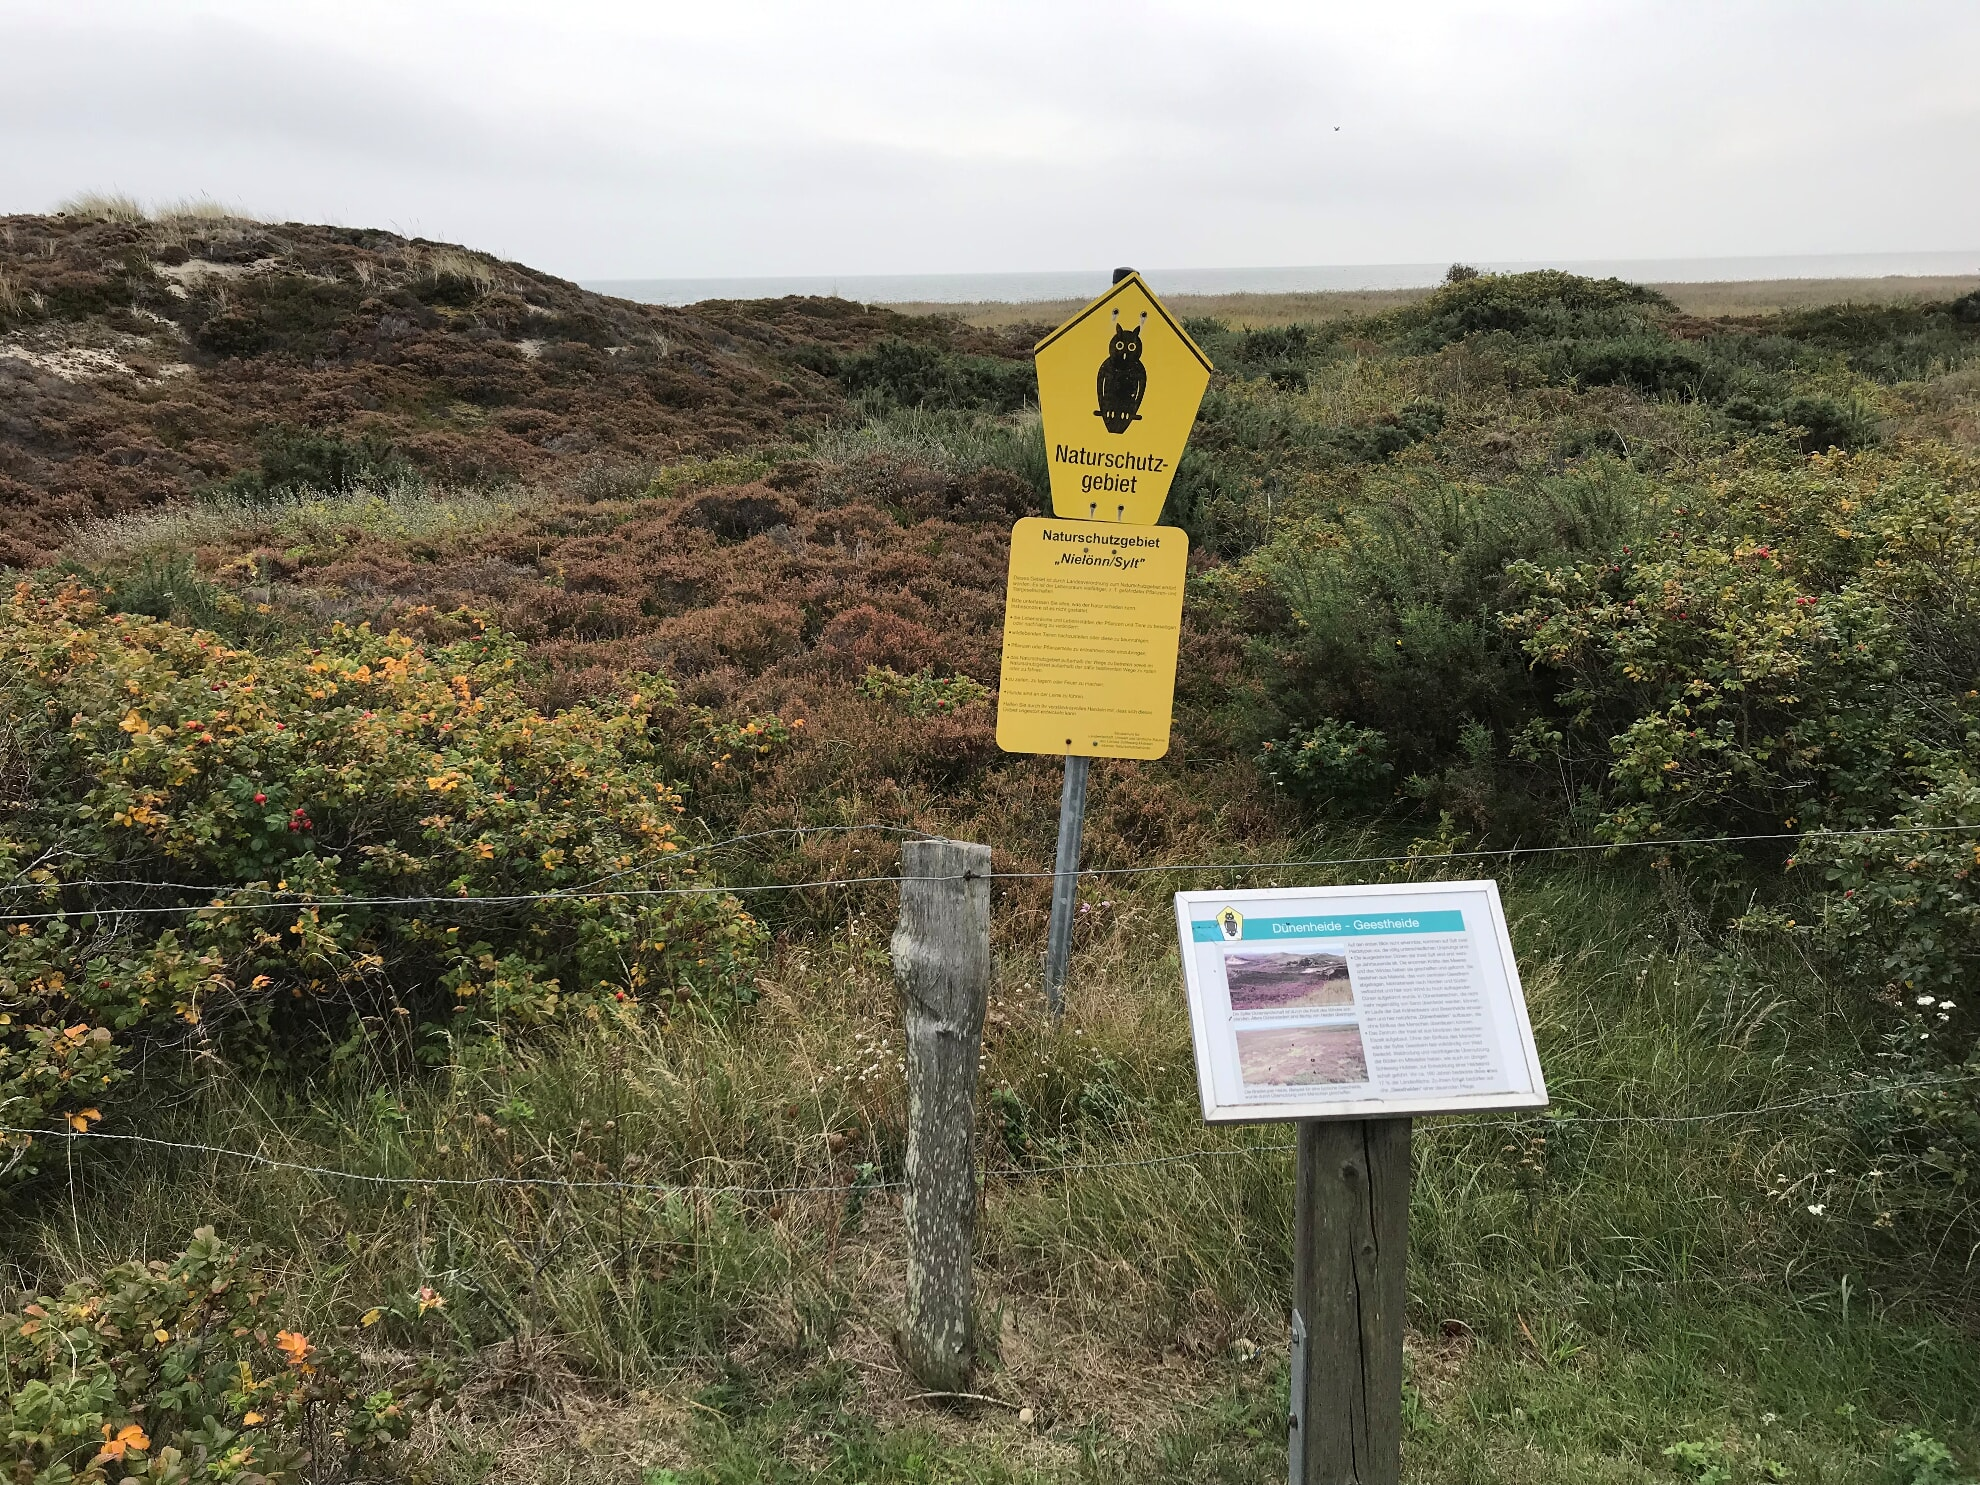 Naturschutzgebiet Nielönn